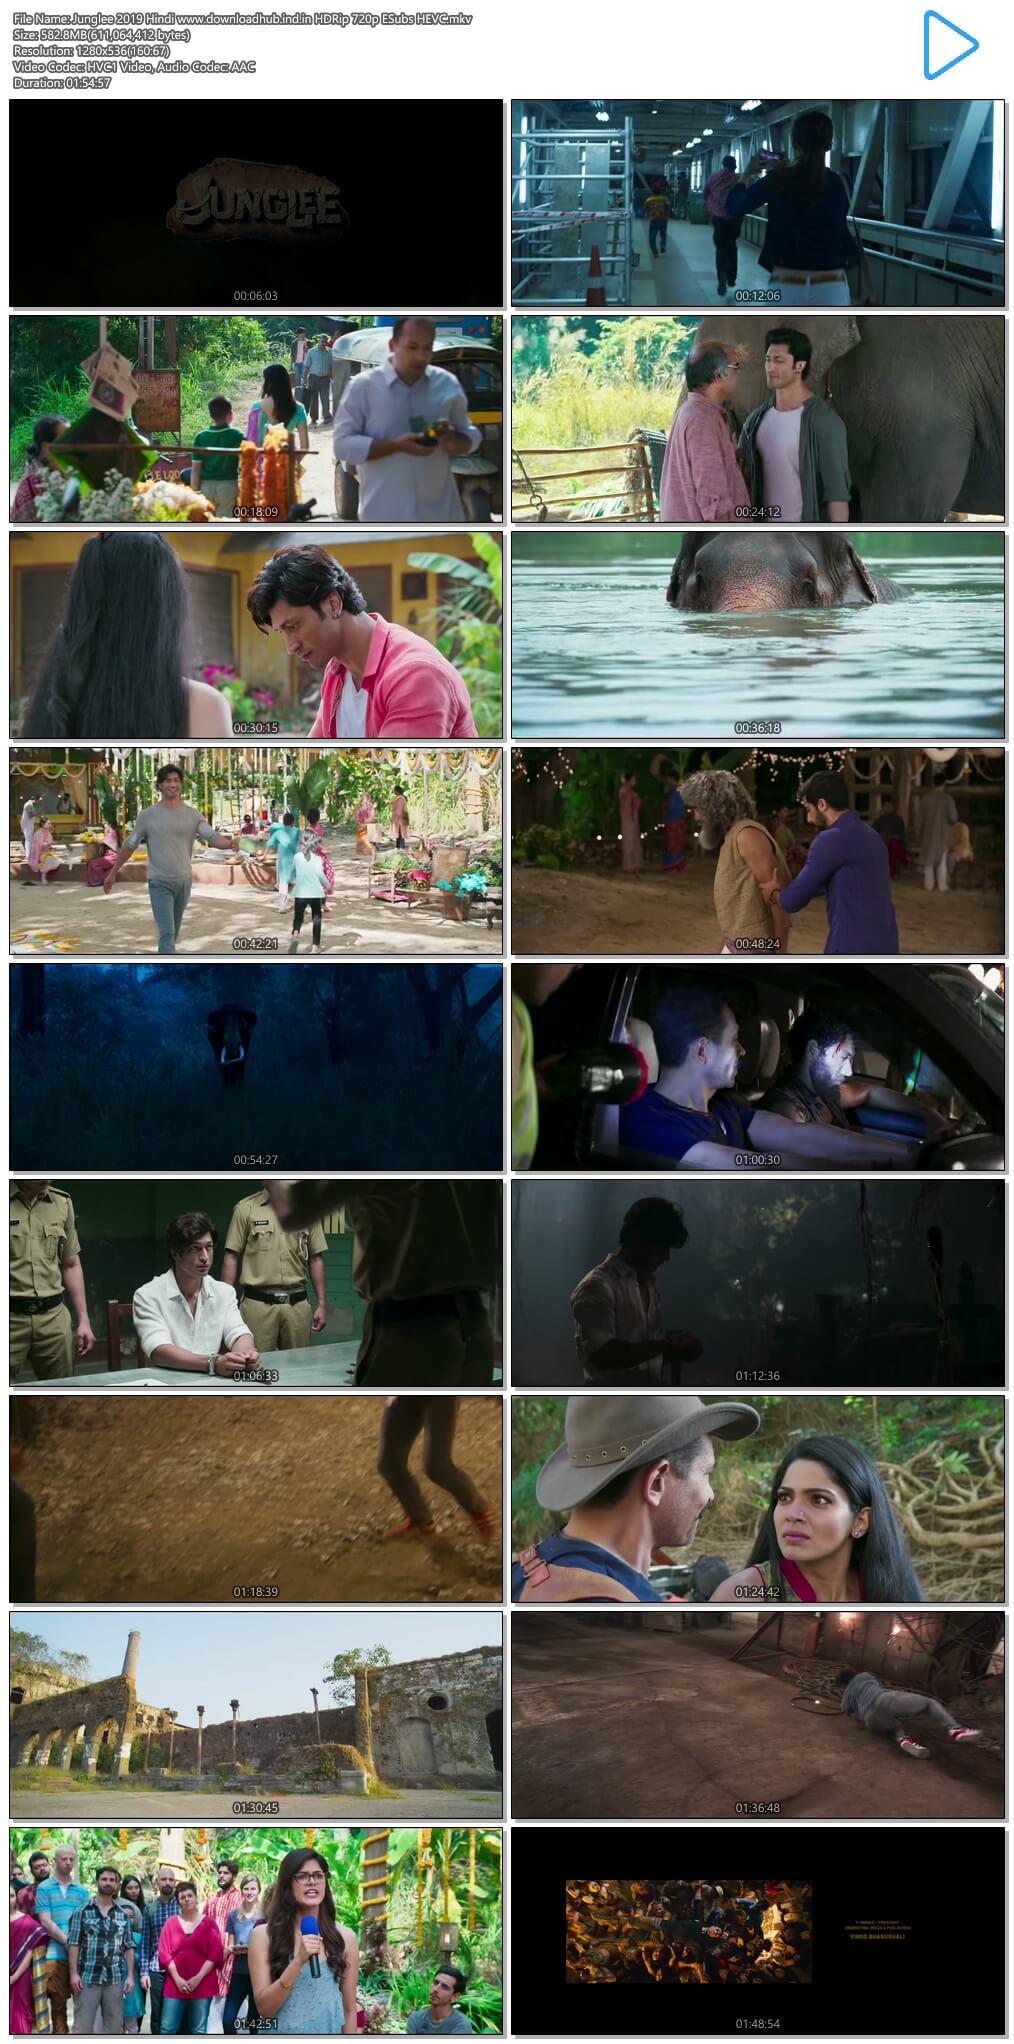 Junglee 2019 Hindi 550MB HDRip 720p ESubs HEVC